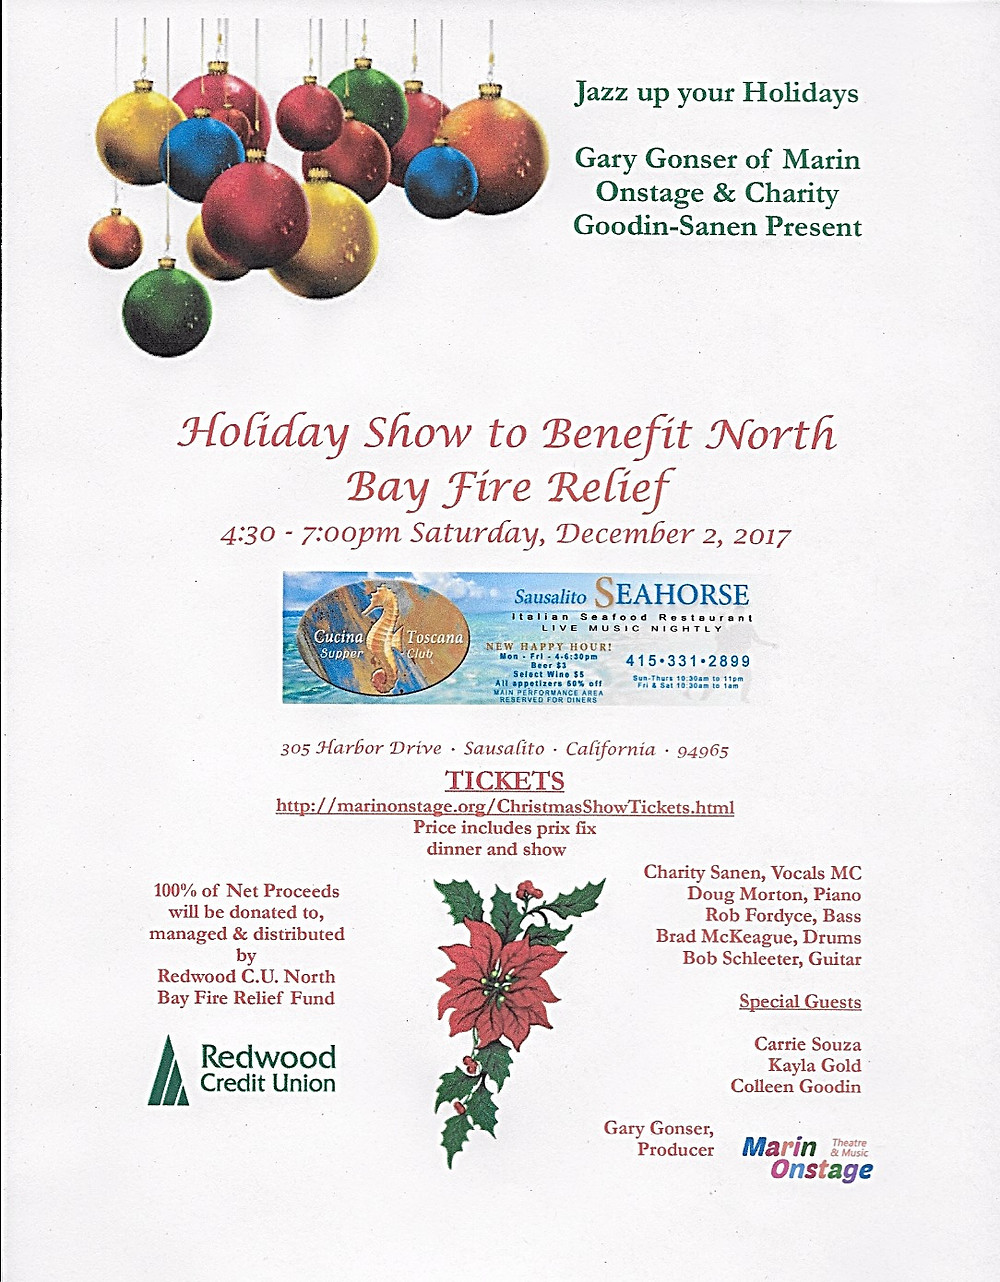 Holiday Jazz Show 12/2/17 Seahorse of Sausalito